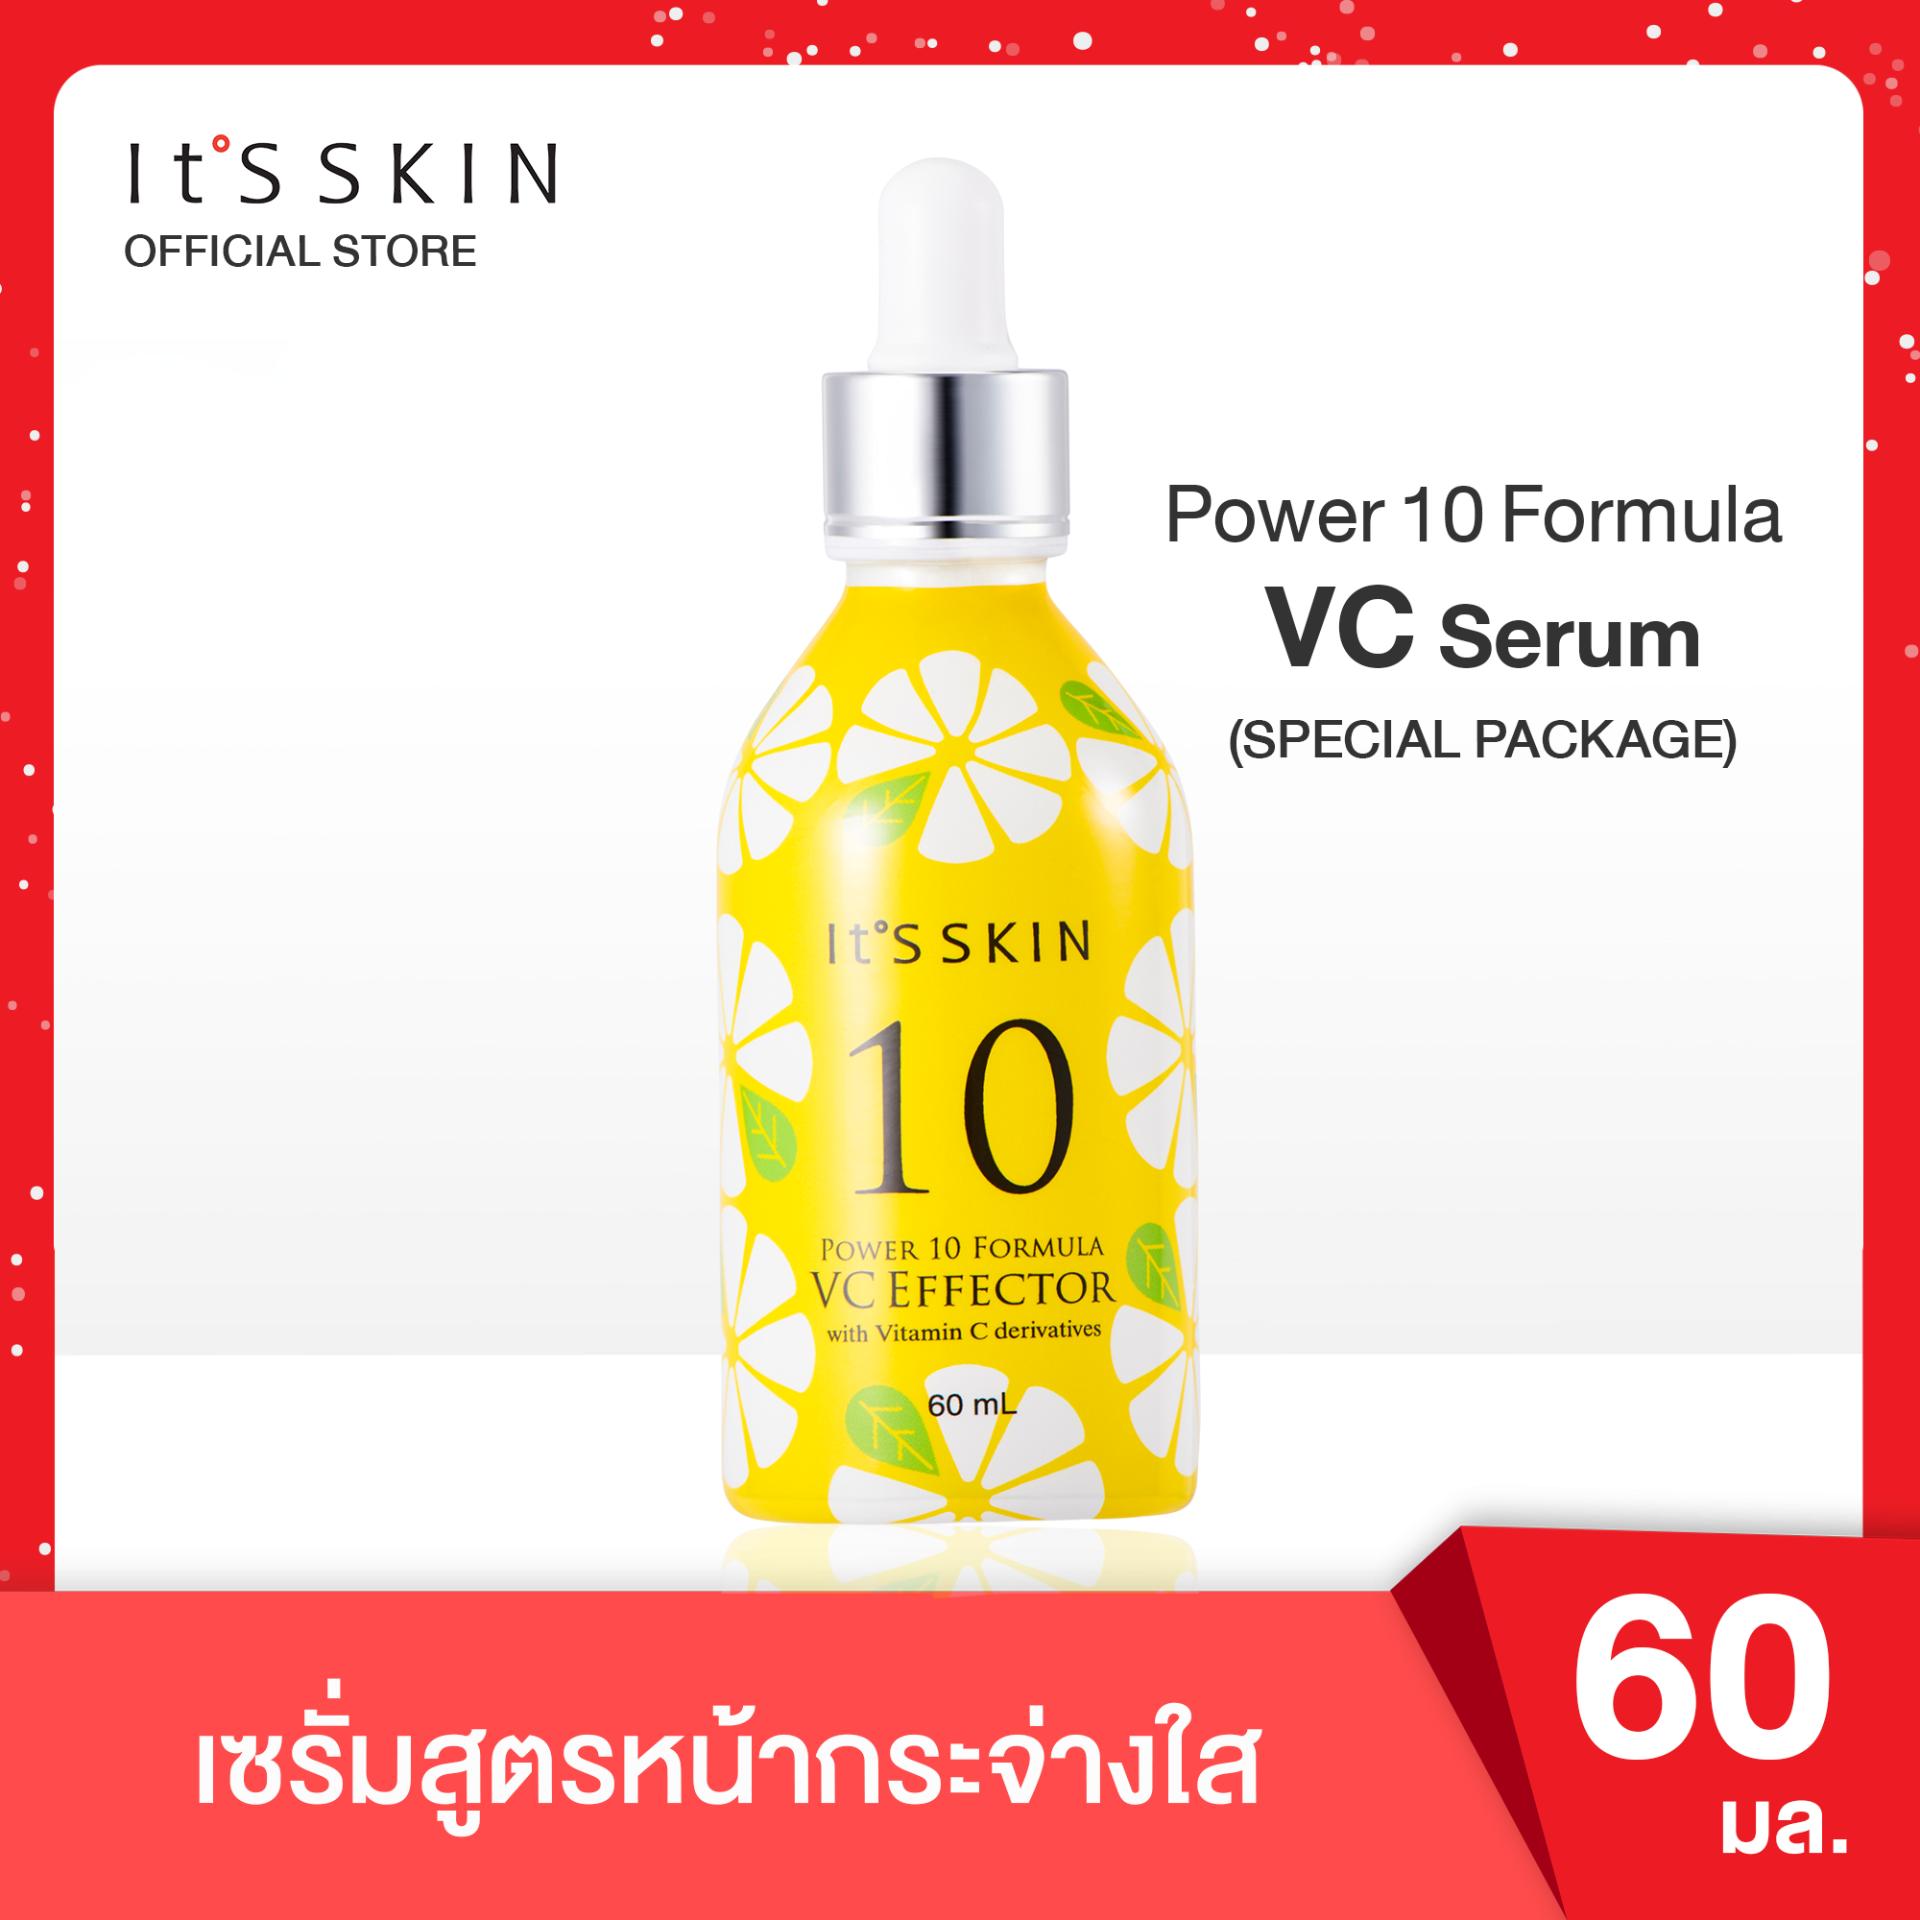 Its Skin Power 10 Formula Vc Serum 60 Ml. (special Package) - อิทสกิน พาวเวอร์เท็น เซรั่ม วิตามินซี สูตรหน้ากระจ่างใส.